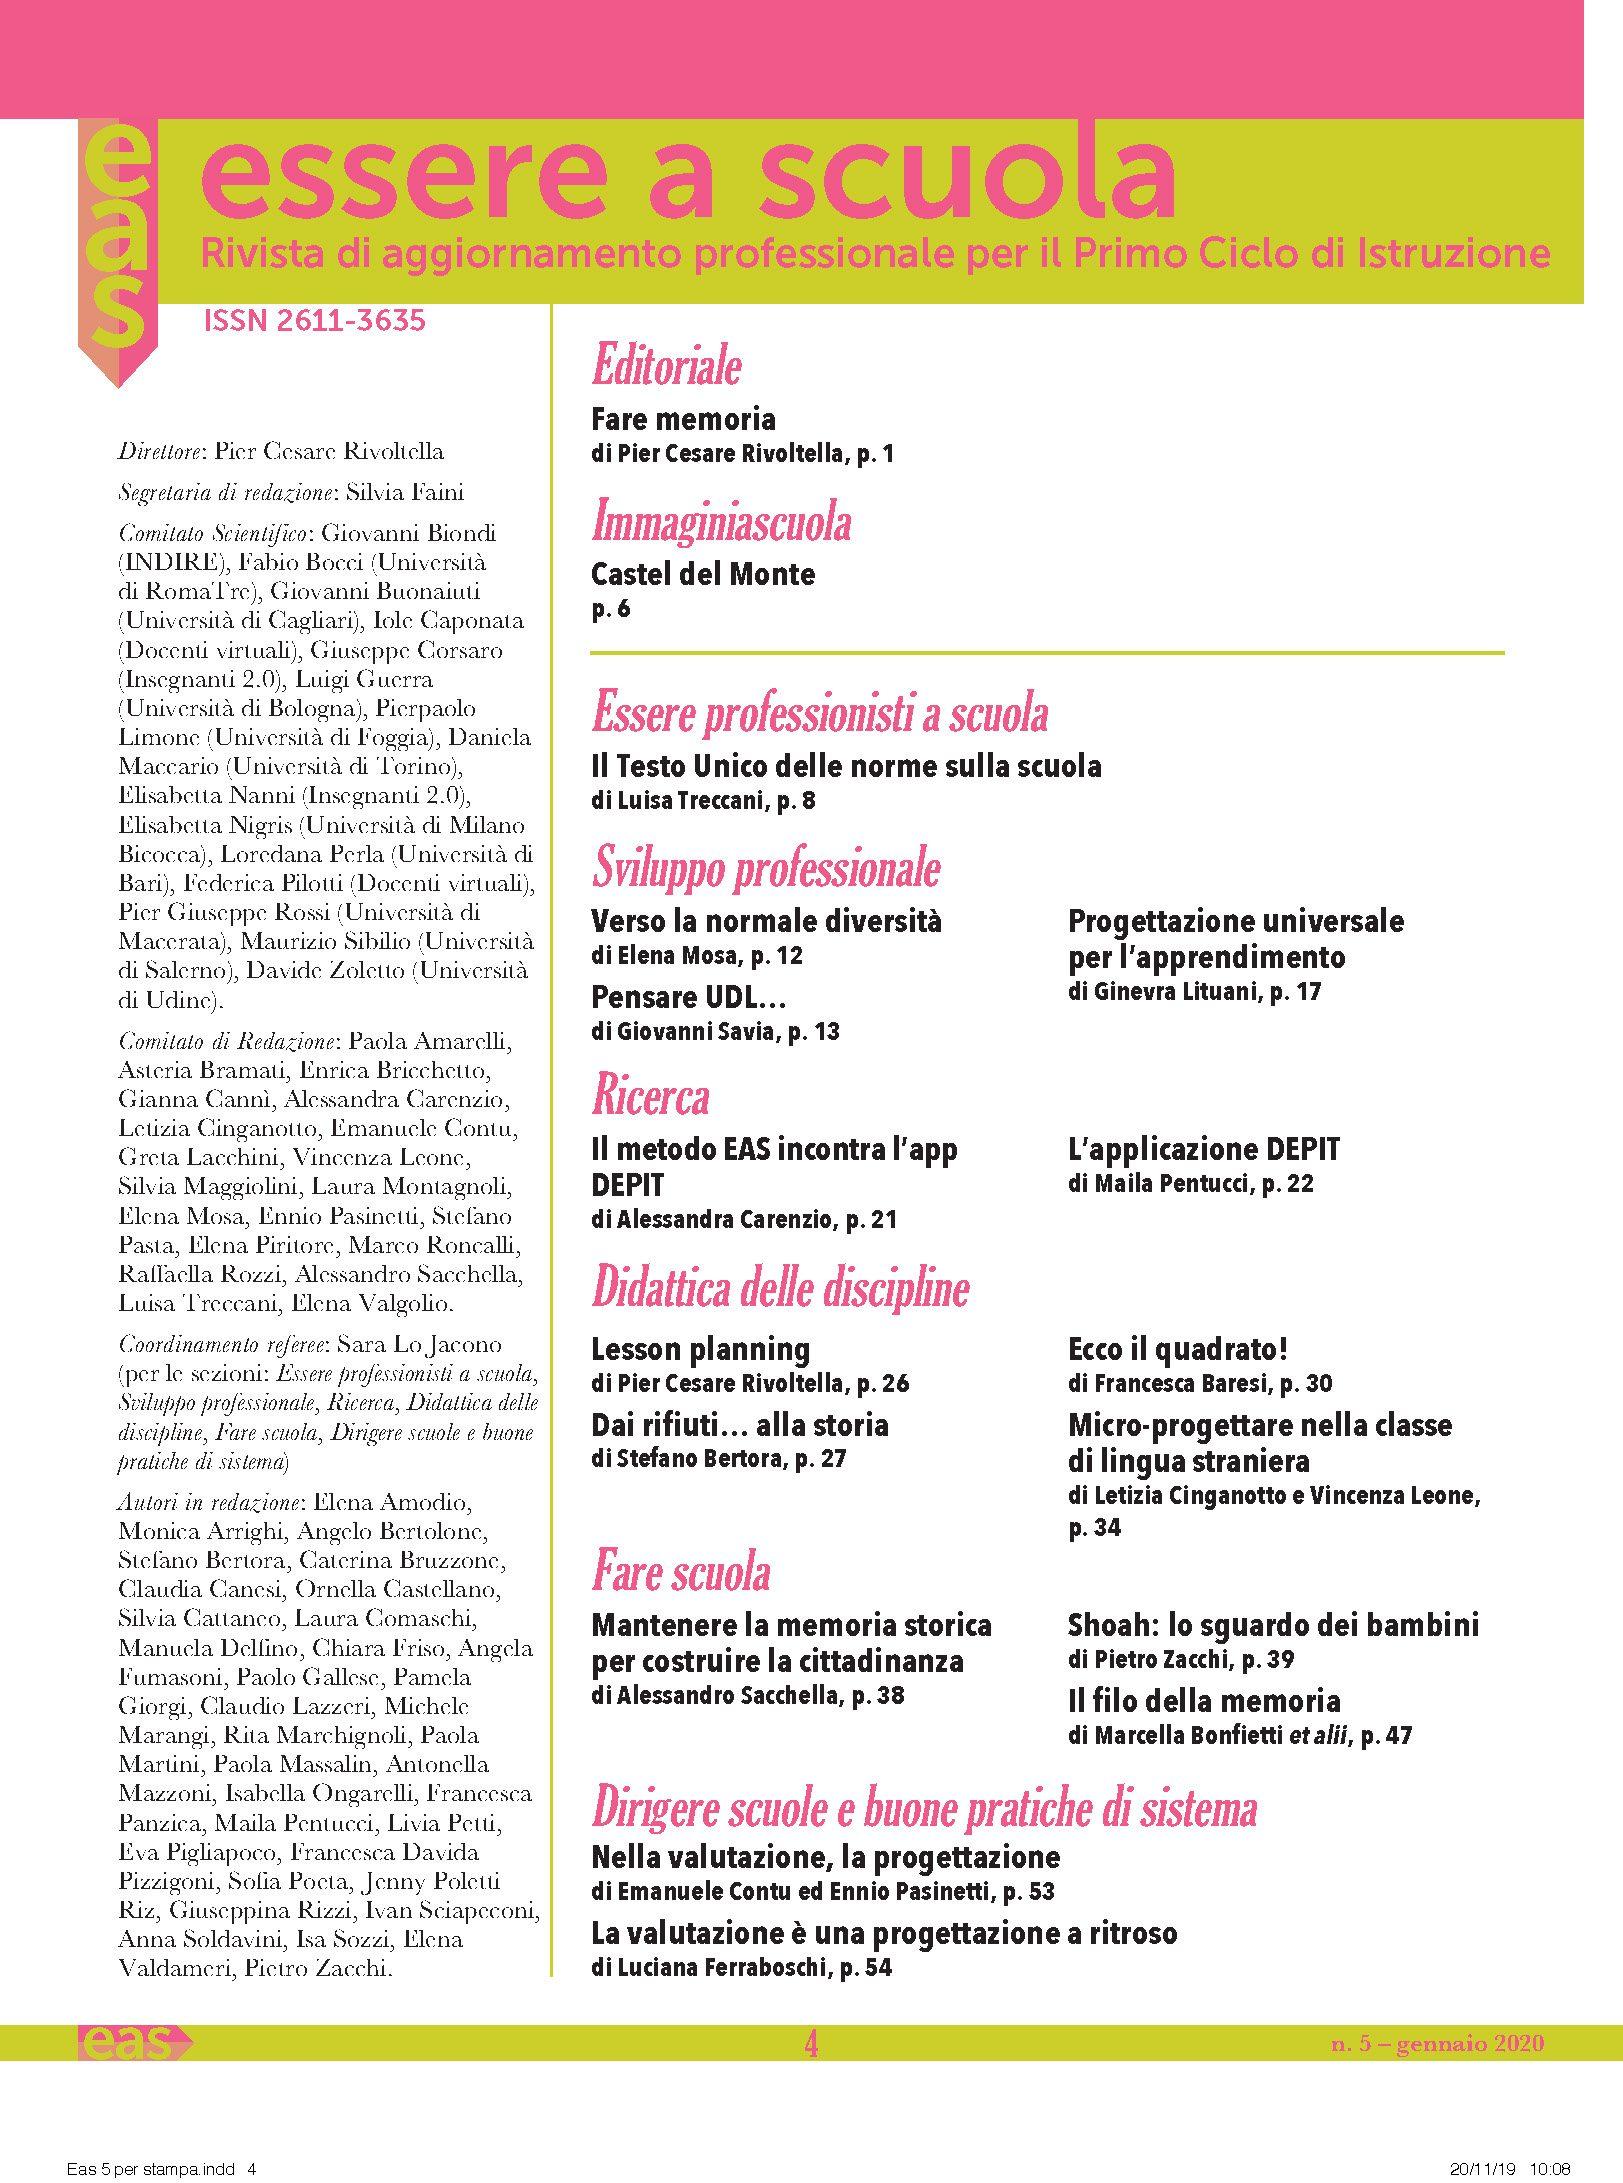 Sommario Eas 3_Pagina_1.jpg